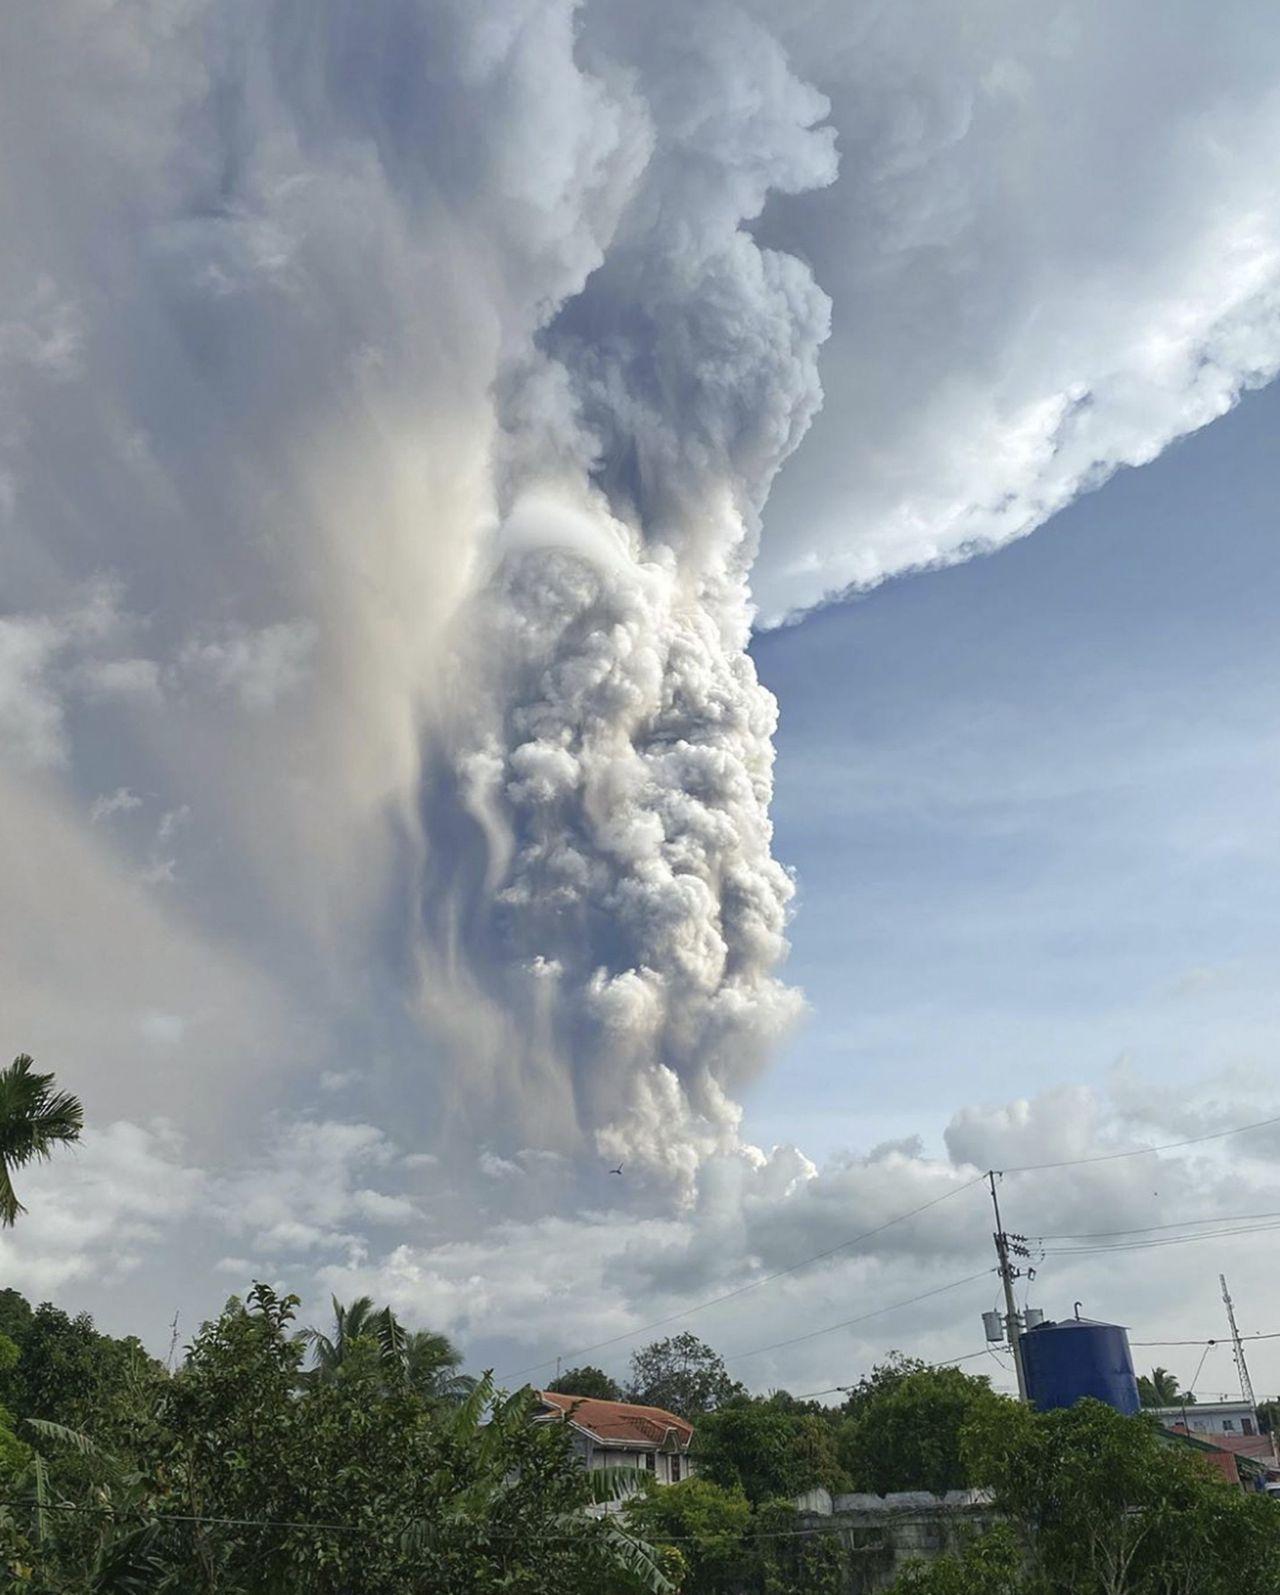 塔阿爾火山(Taal)爆發。美聯社